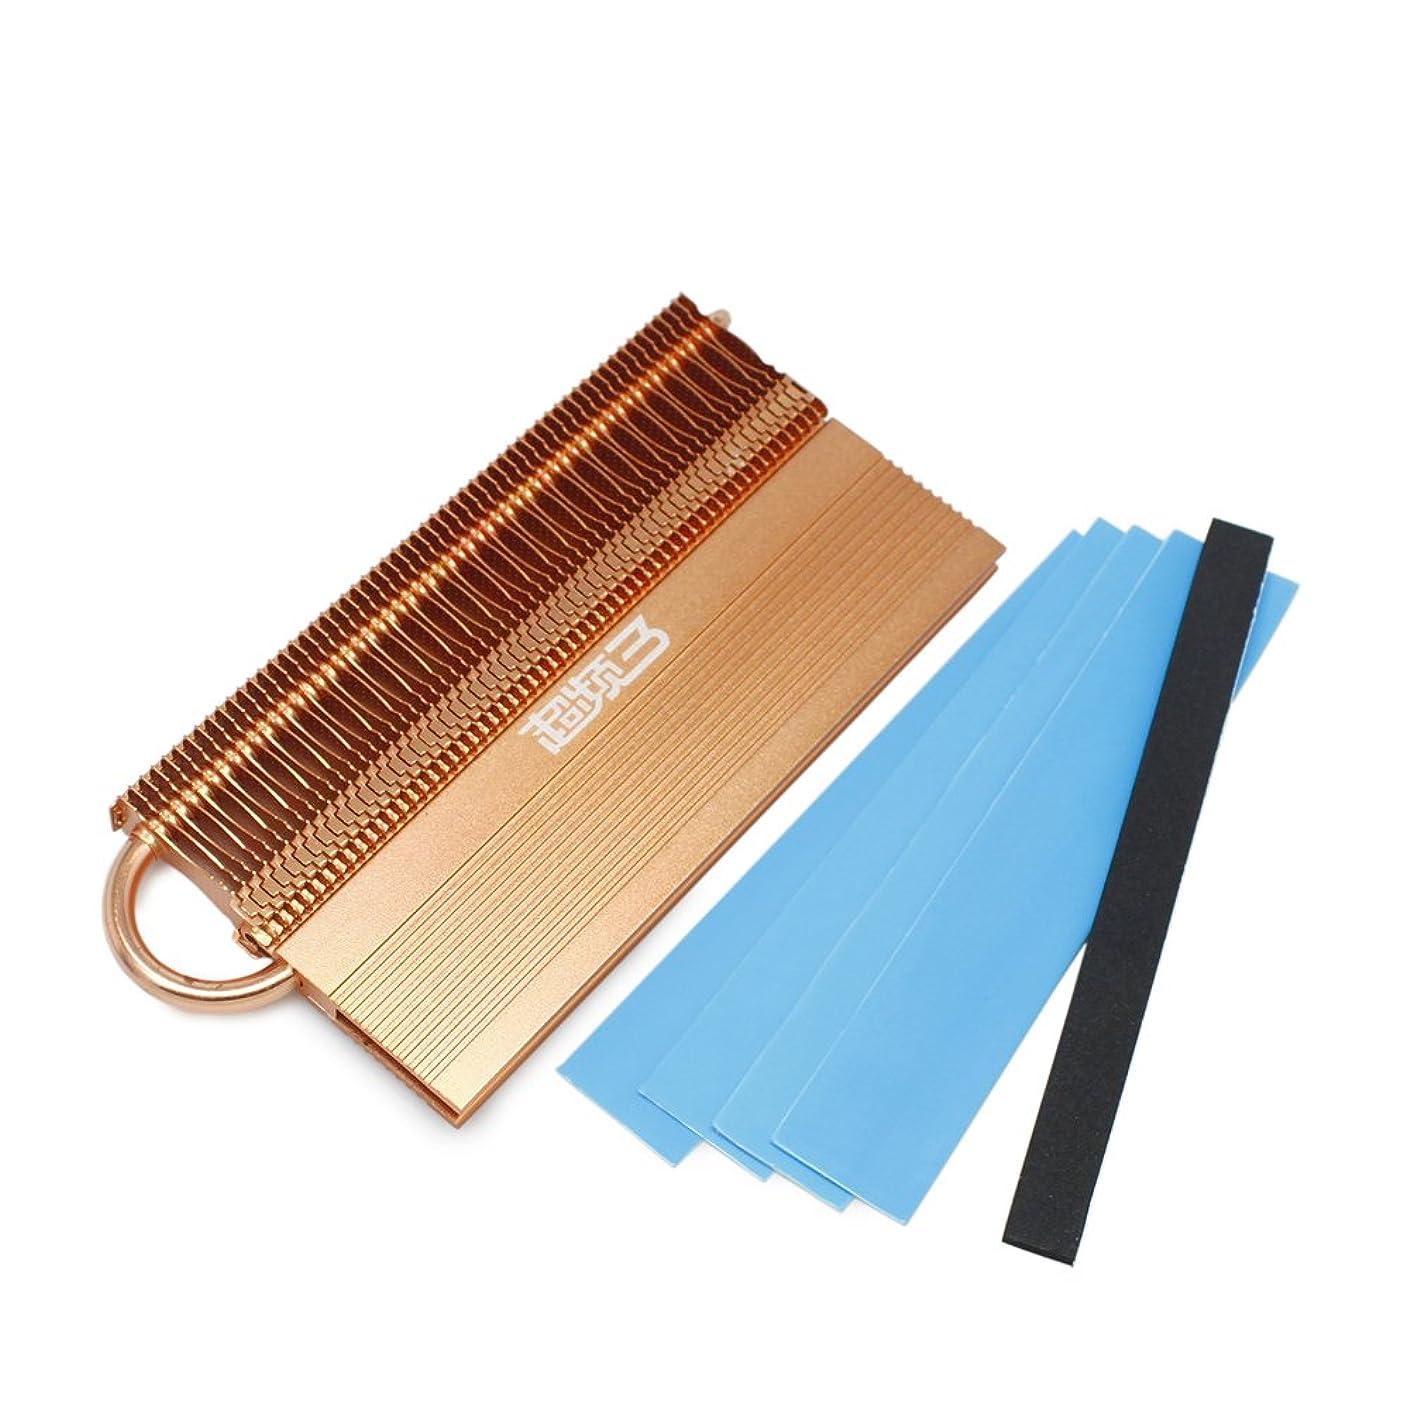 Aluminium w/ Copper Heat pipe Heatsink Heat Spreader For DDR RAM Memory Cooling